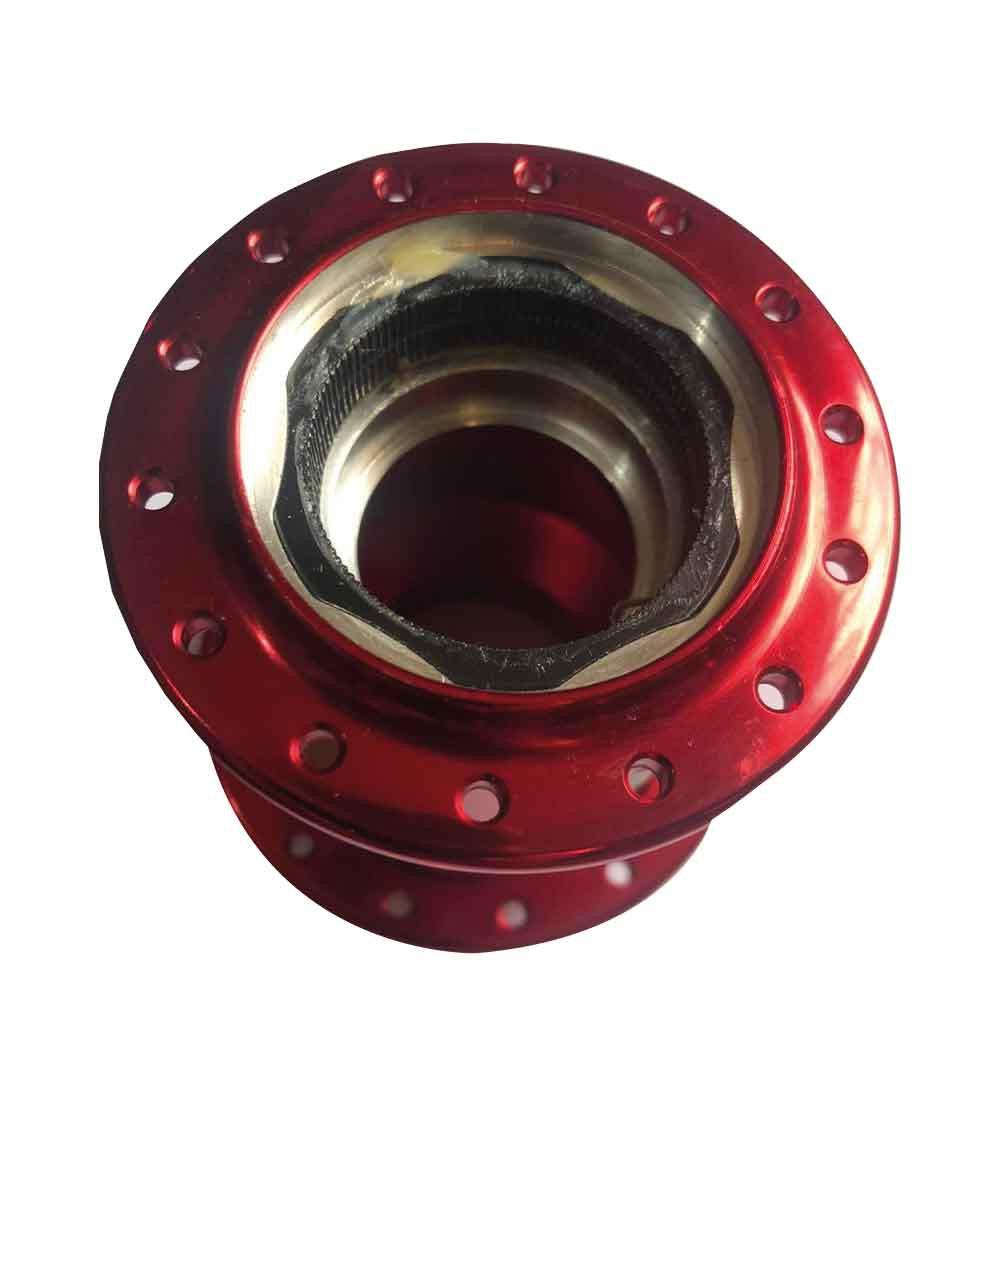 Carcaça Cubo Vzan mgc Systen vermelho 135/142 anel estriado